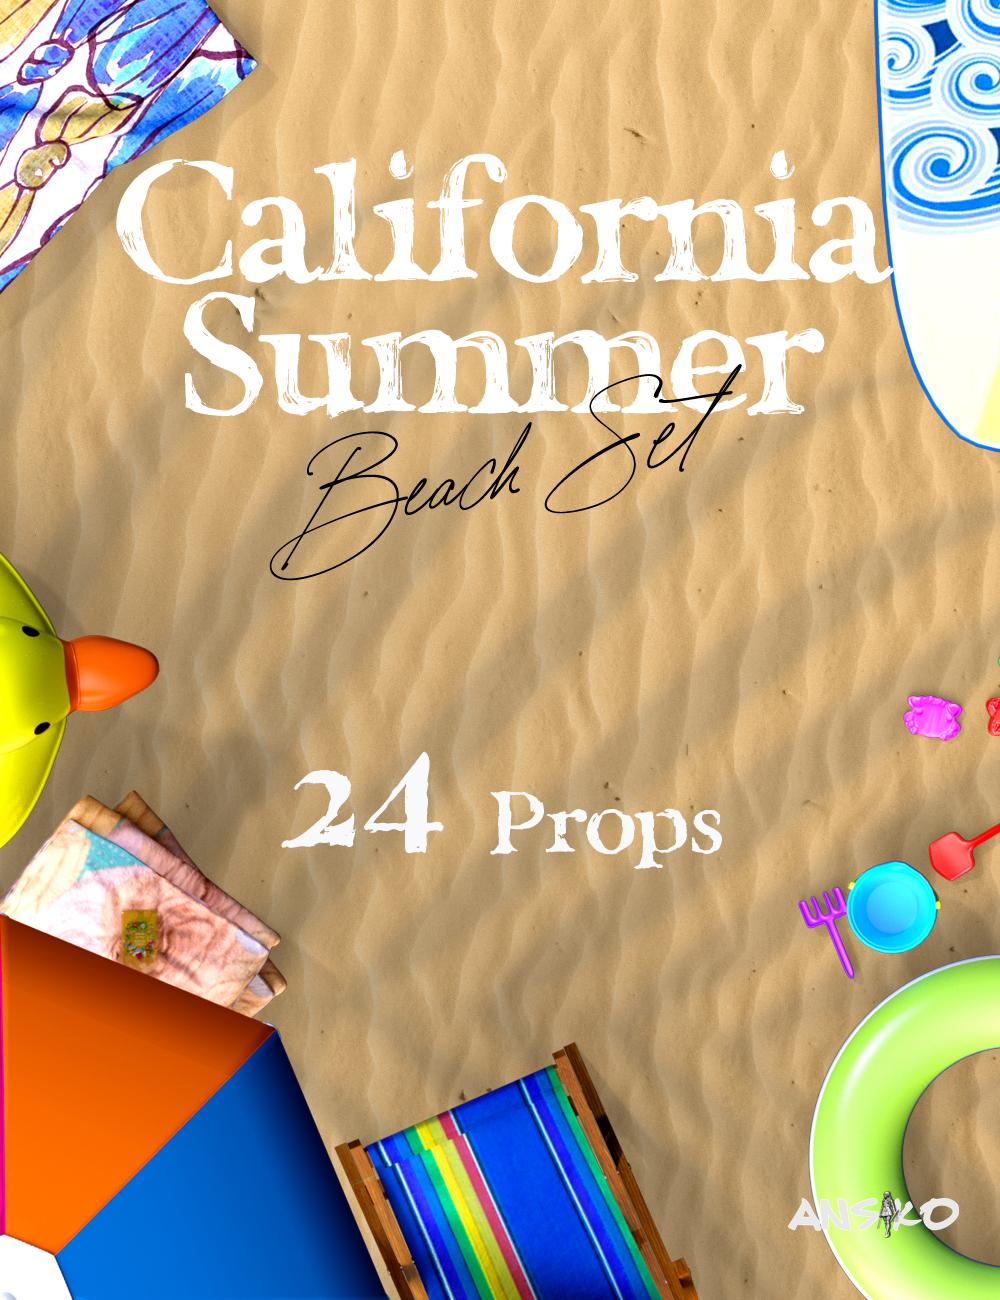 California Summer Beach Props by: Ansiko, 3D Models by Daz 3D